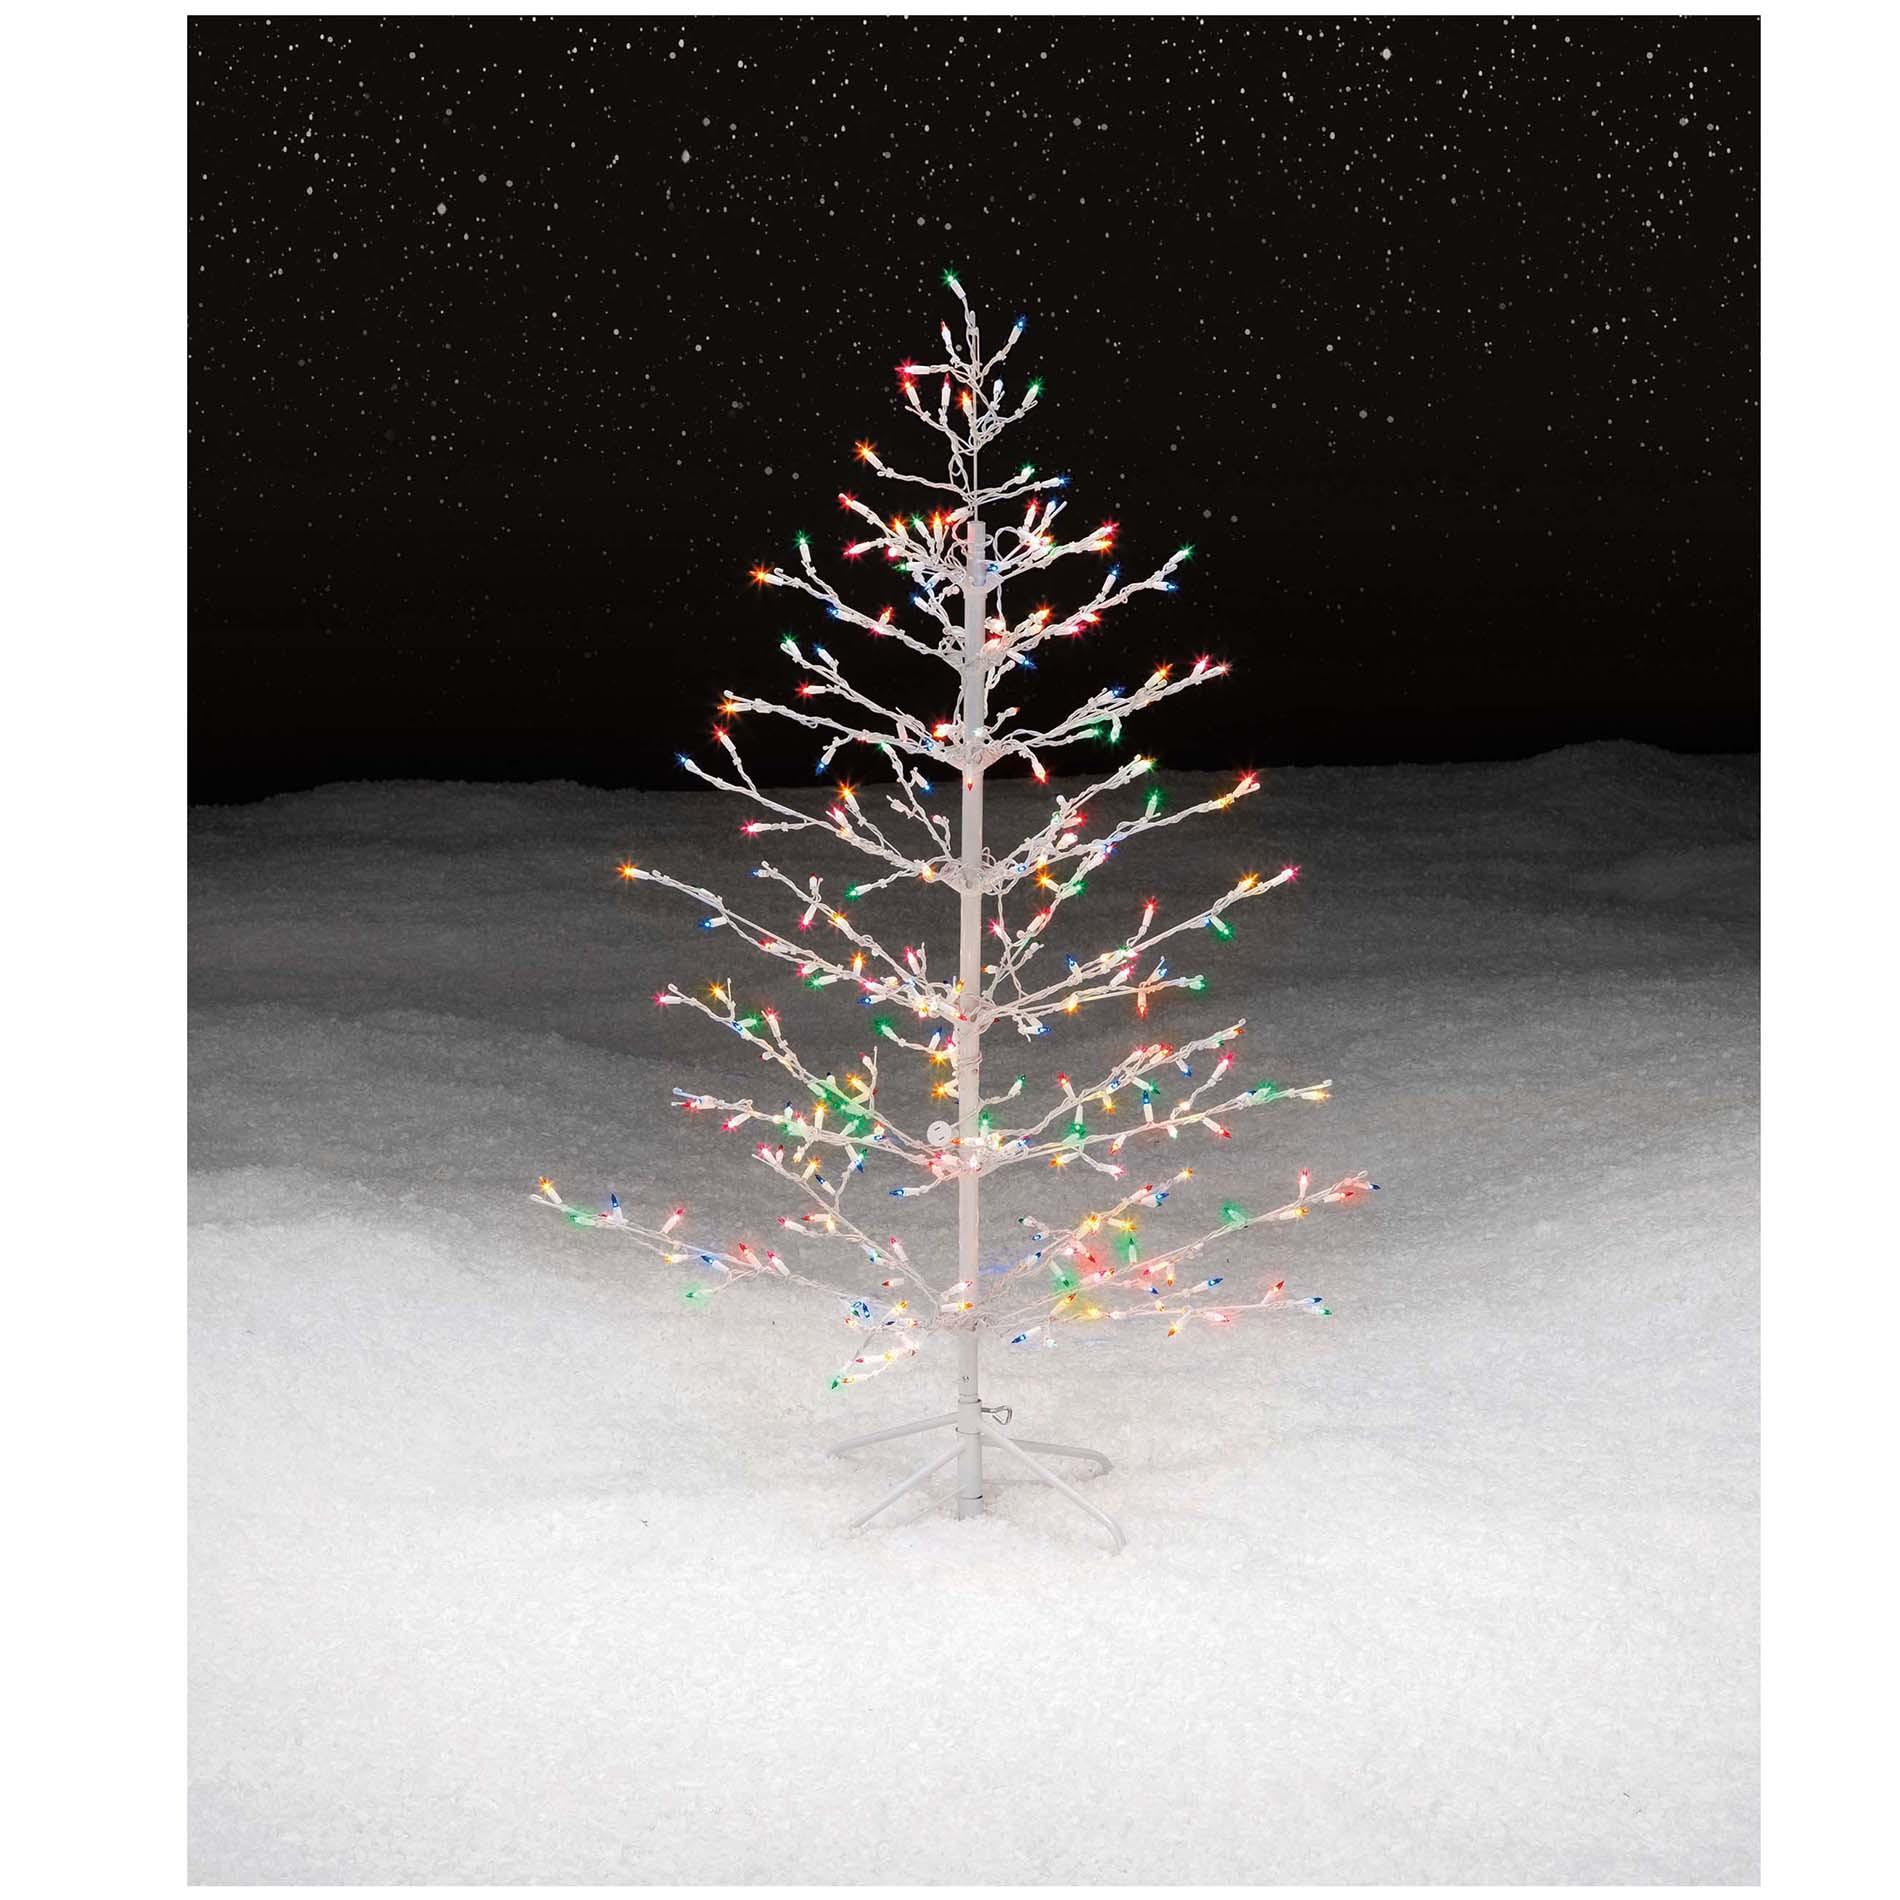 Outdoor Light Up Christmas Tree  Christmas Tree Spiral Lighted Holiday Decor Indoor Outdoor